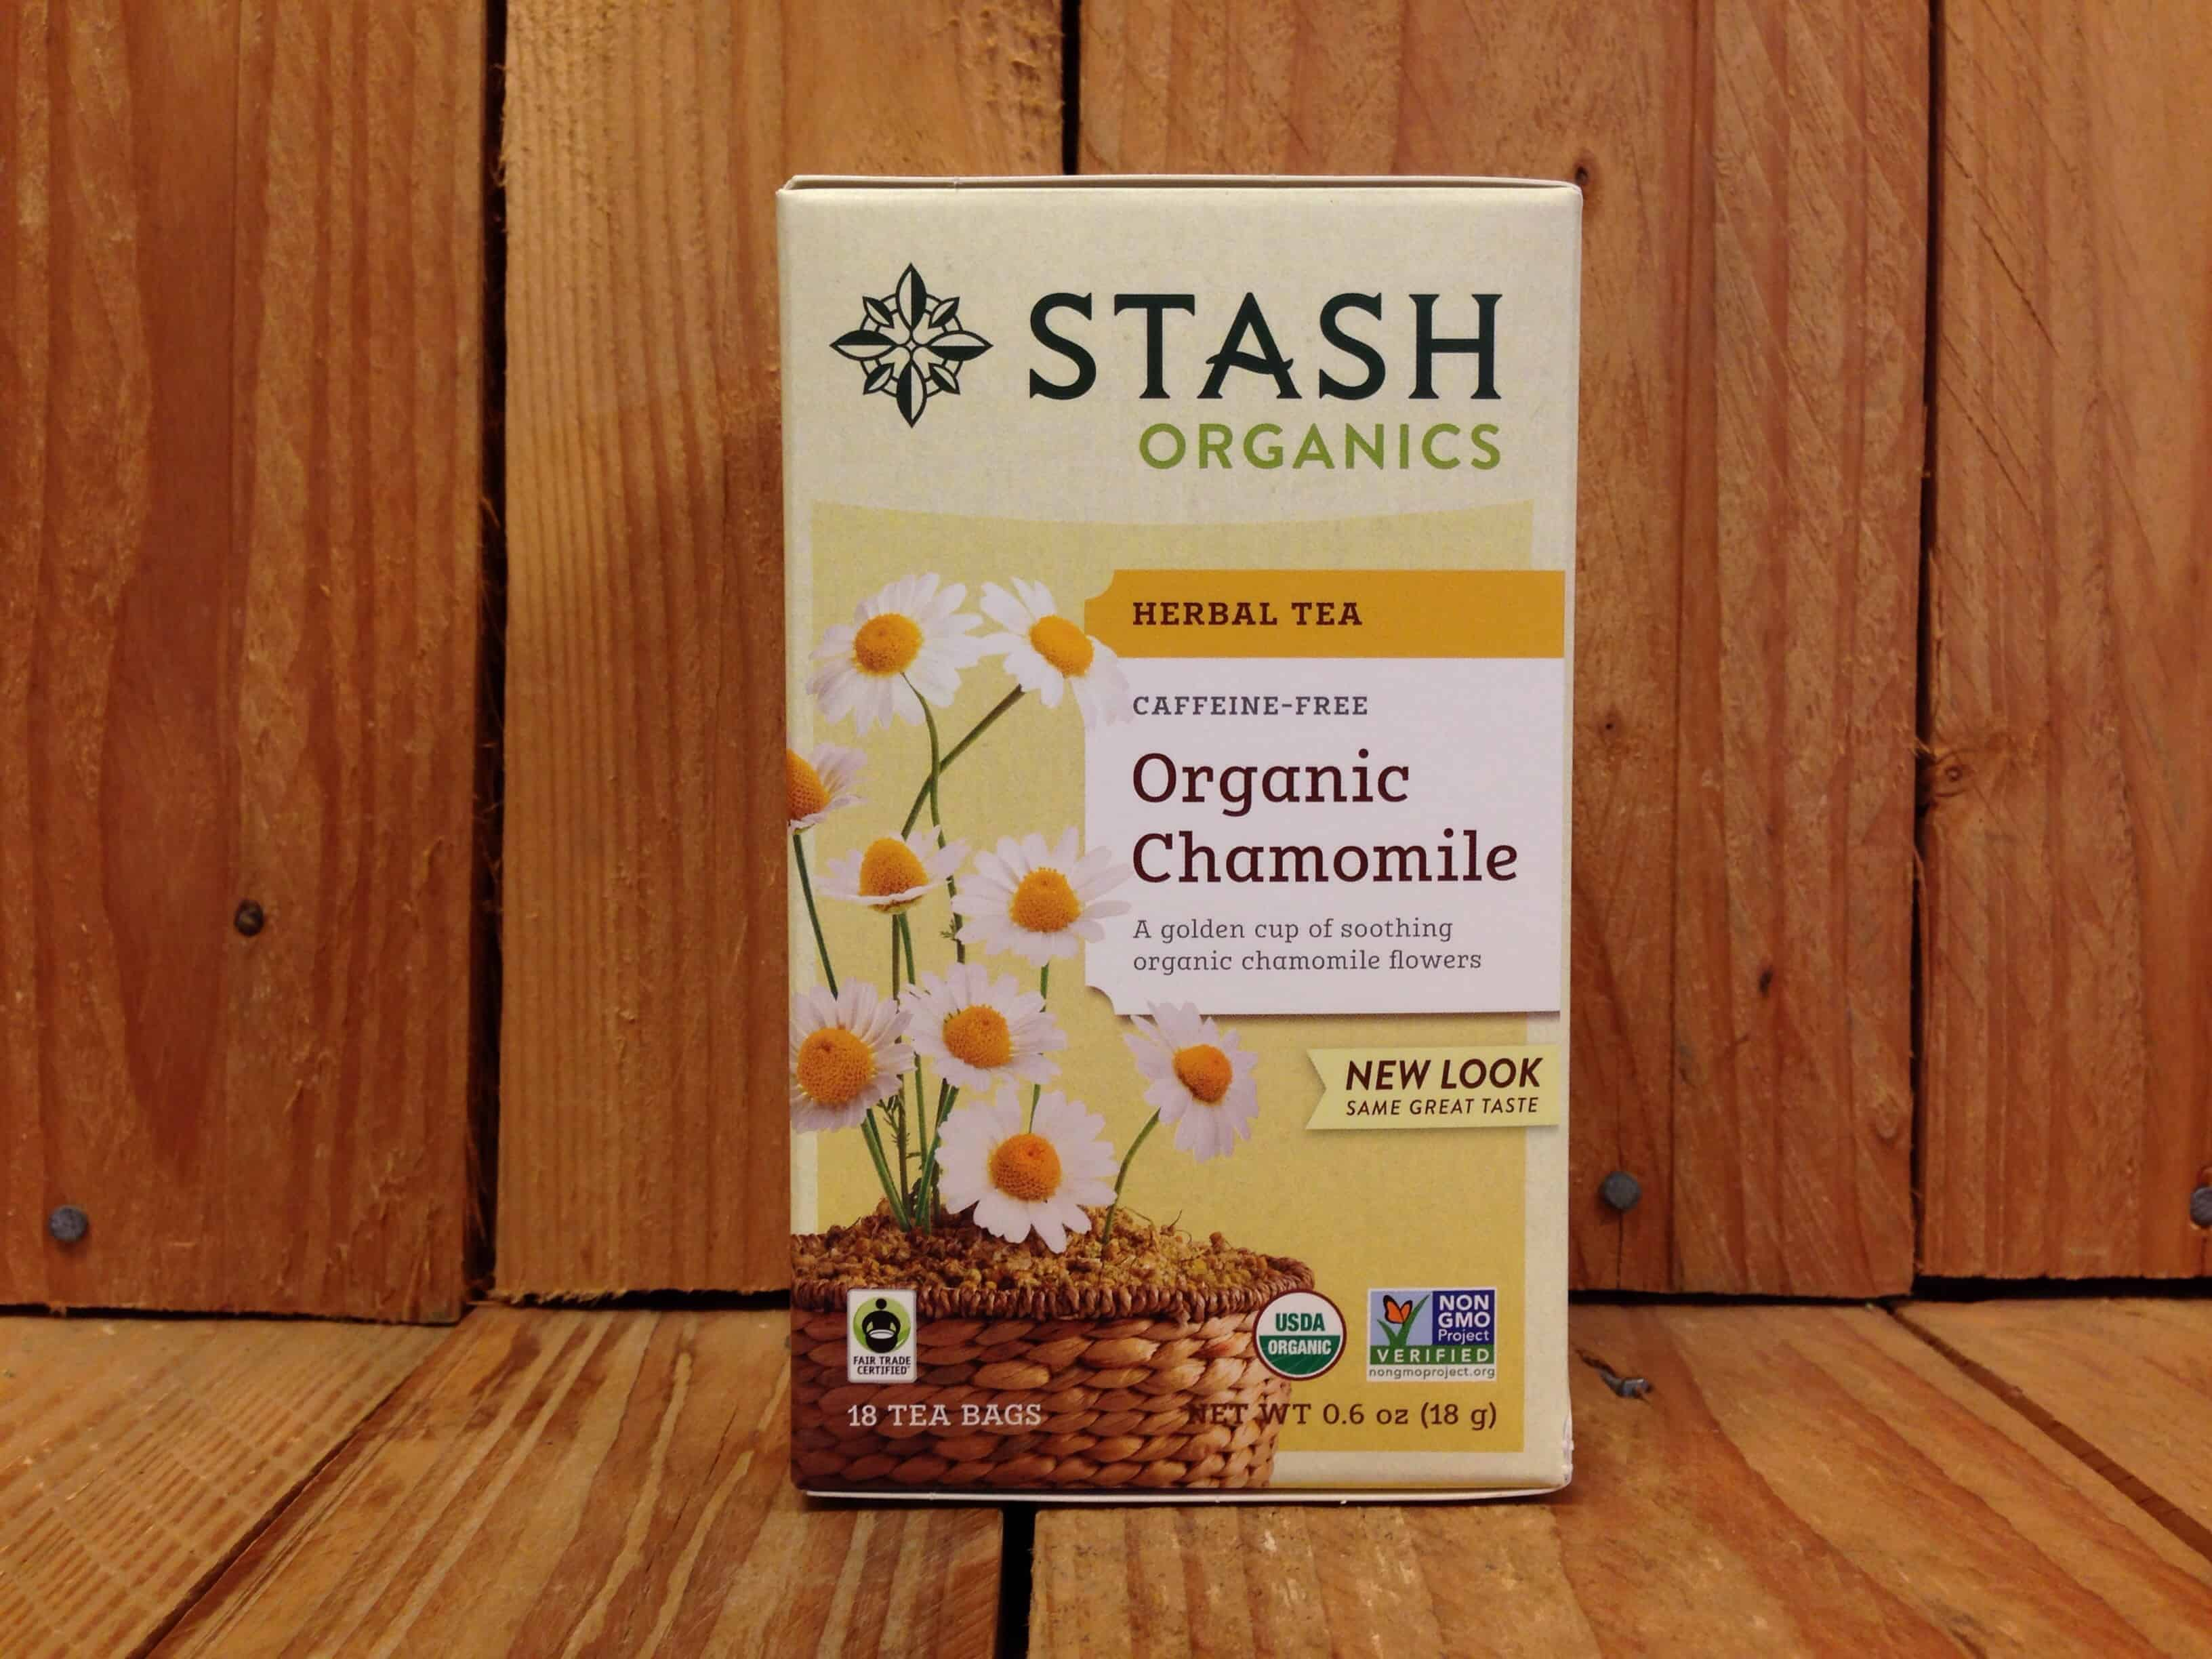 Stash – Organic Chamomile Tea (18 Bags)